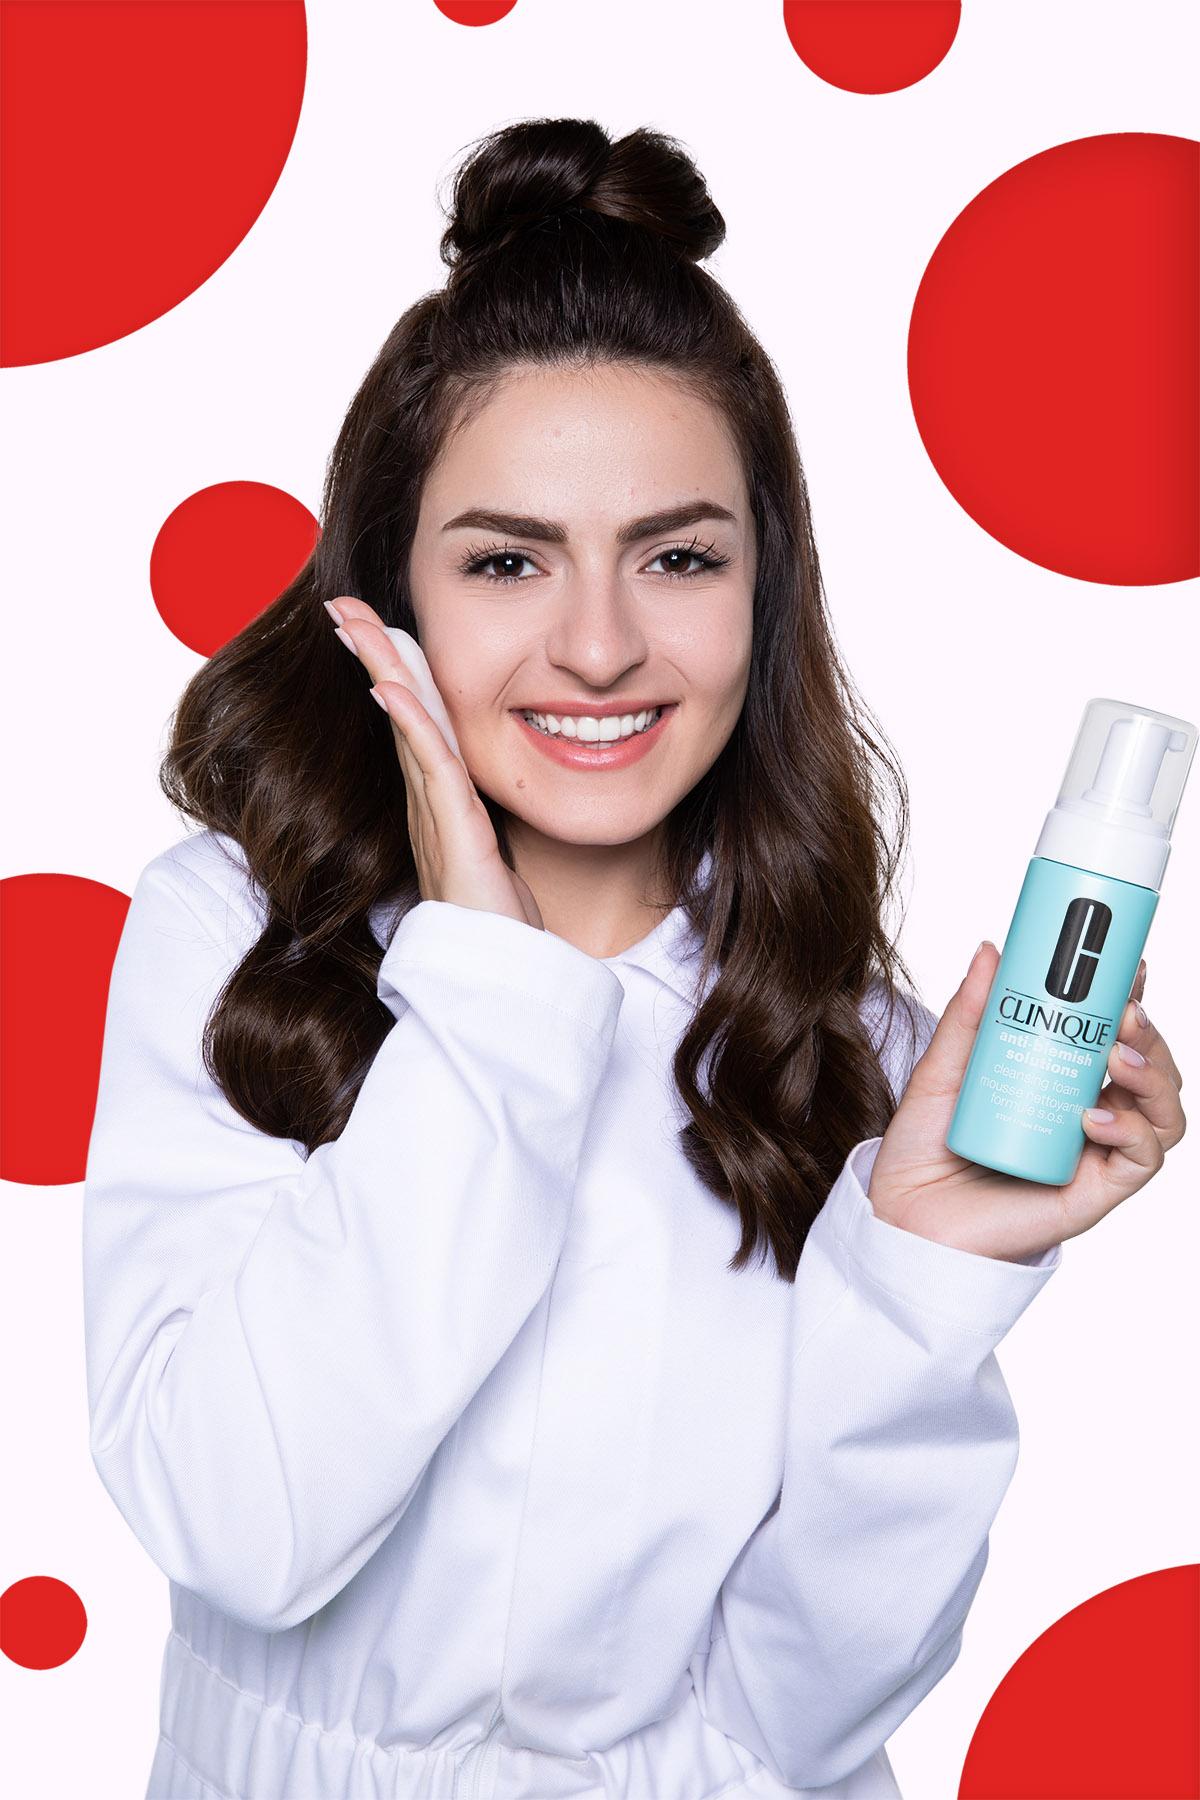 Clinique Anti Blemish Campaign Shoot by Loesje Kessels - Beauty Photographer Dubai